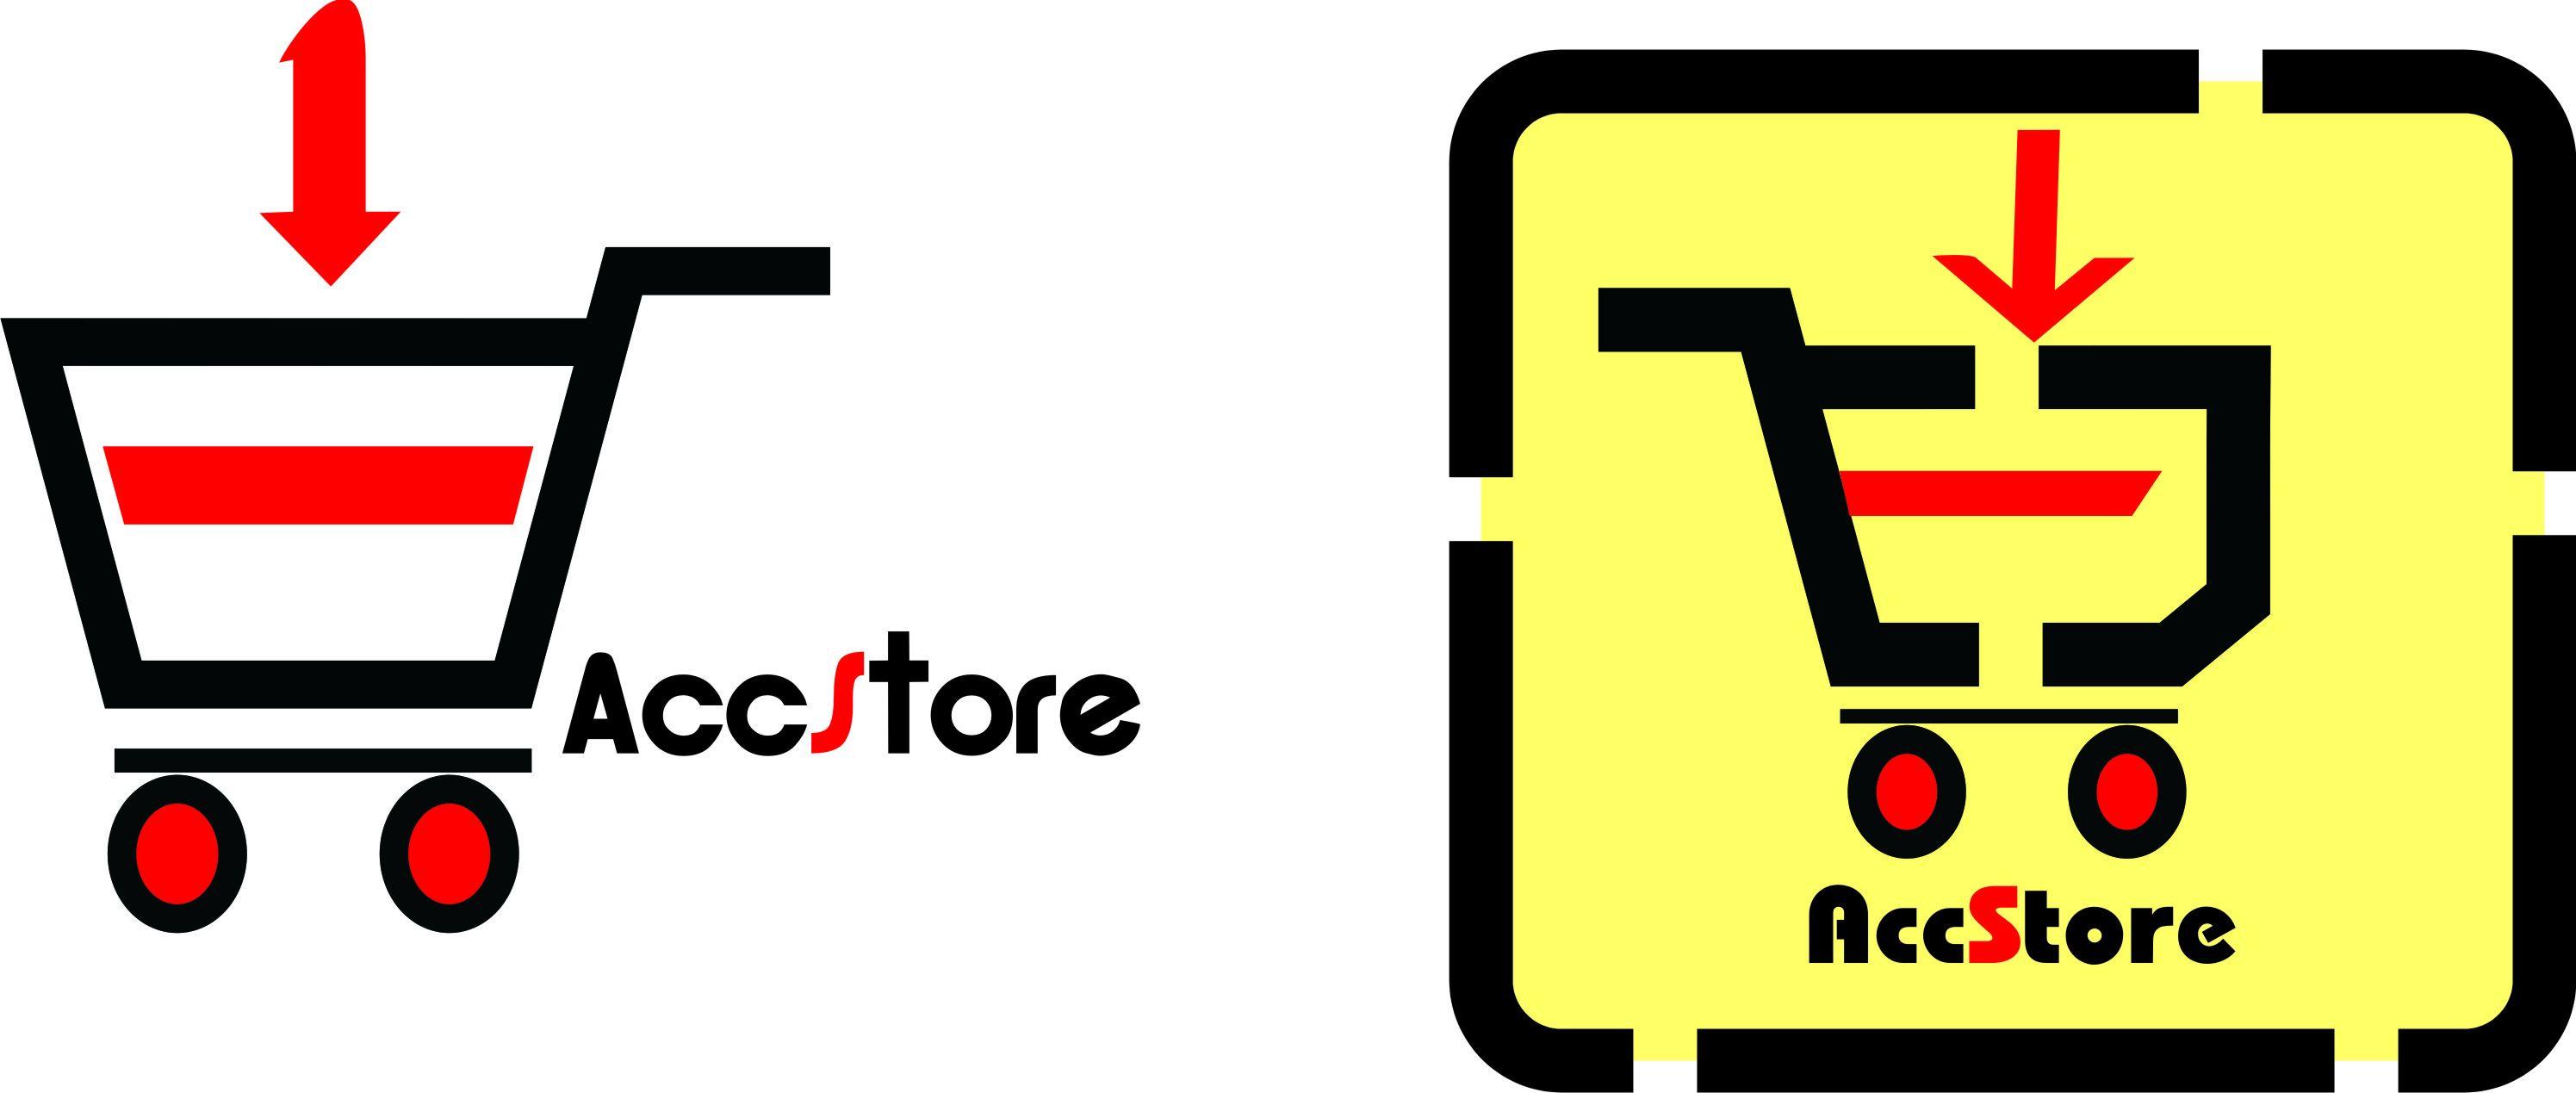 Логотип для магазина аккаунтов - дизайнер Juuuliiiii